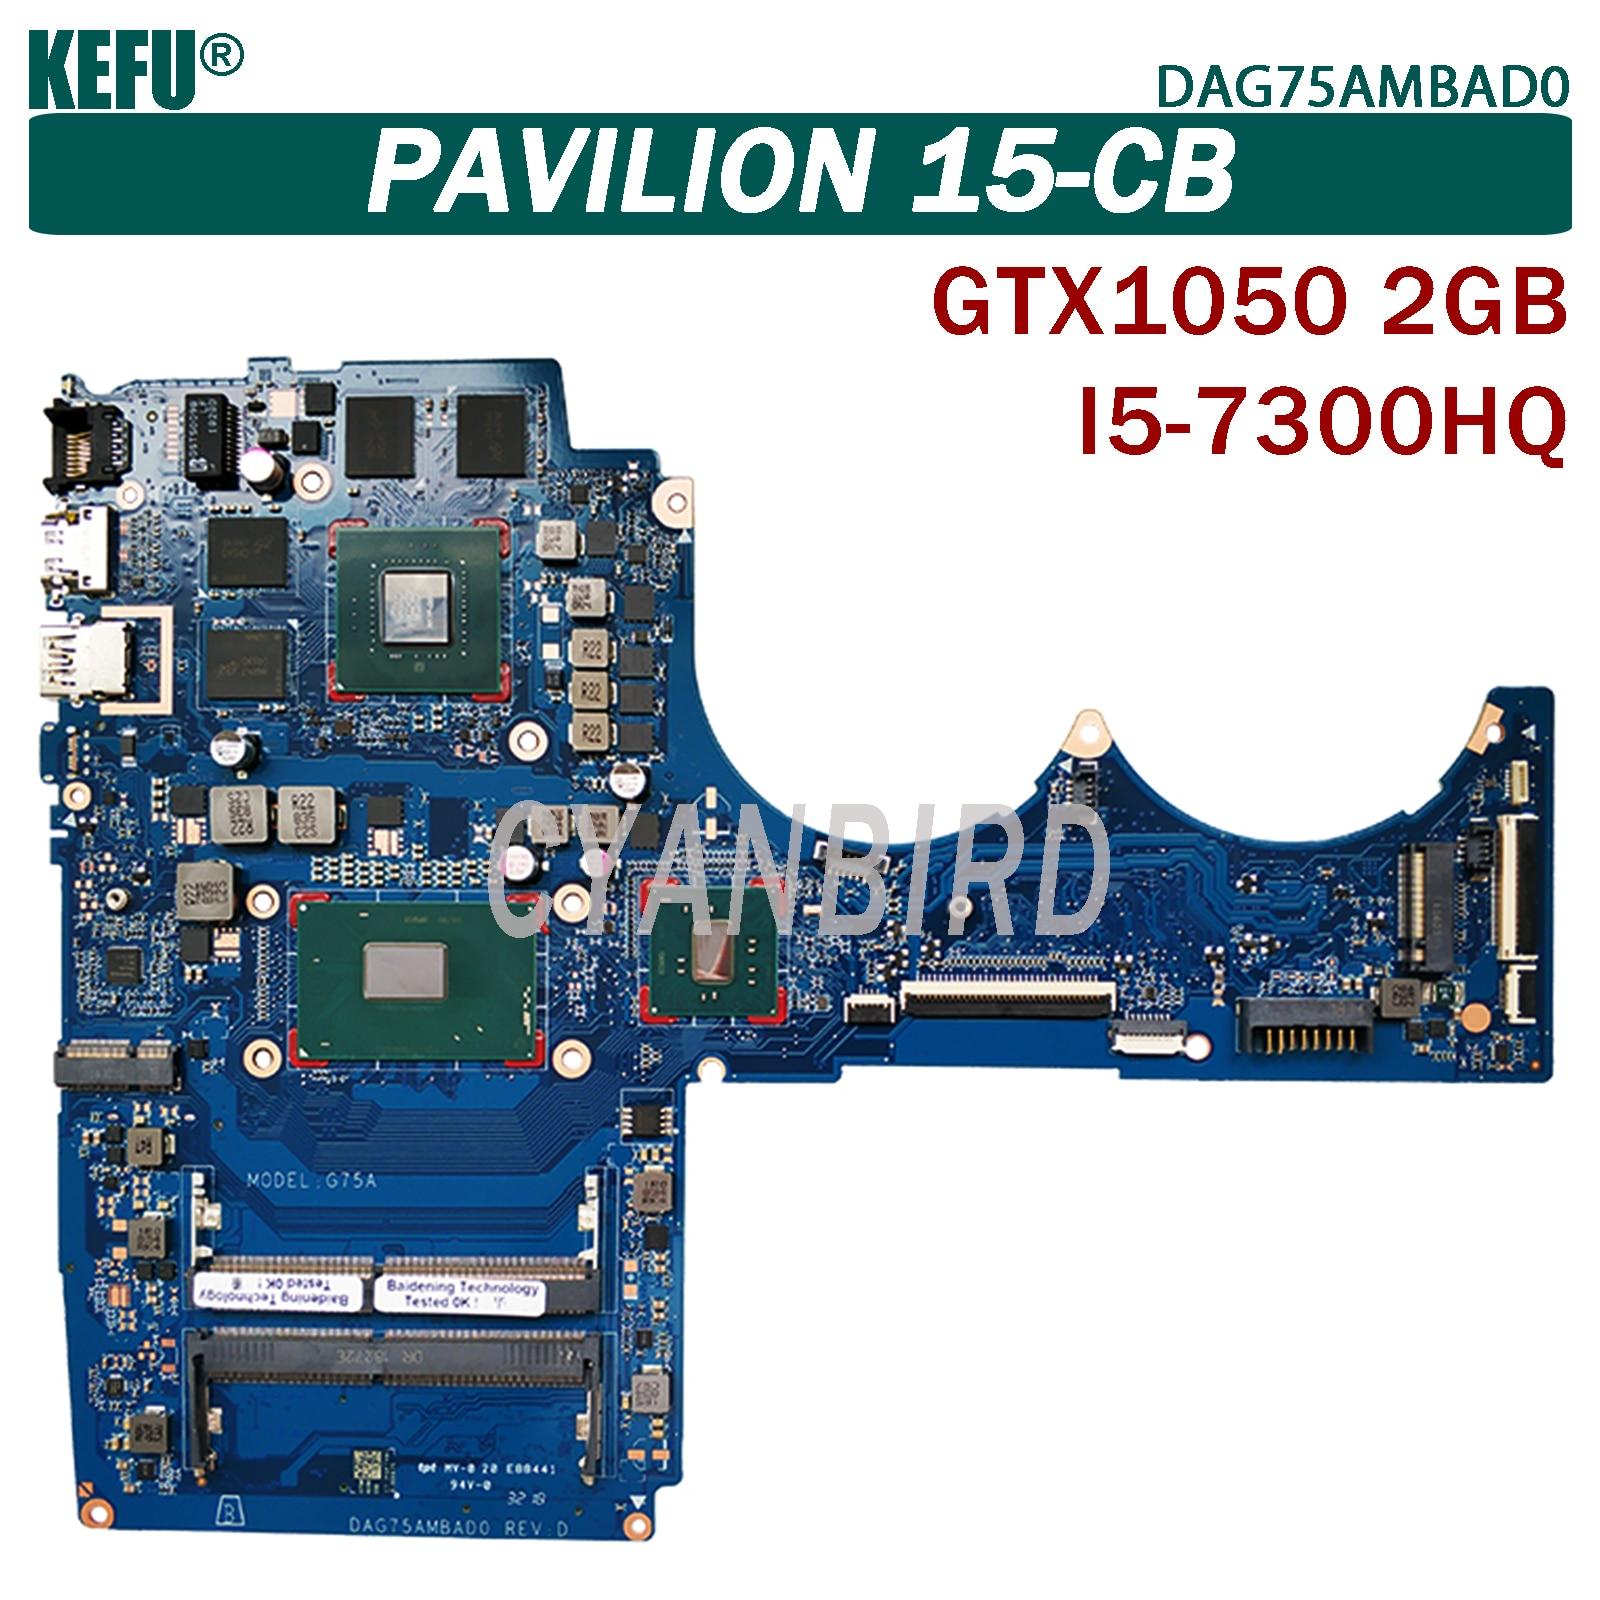 KEFU DAG75AMBAD0 اللوحة الرئيسية الأصلية ل HP بافيليون 15-CB مع I5-7300HQ اللوحة الأم GTX1050-2GB